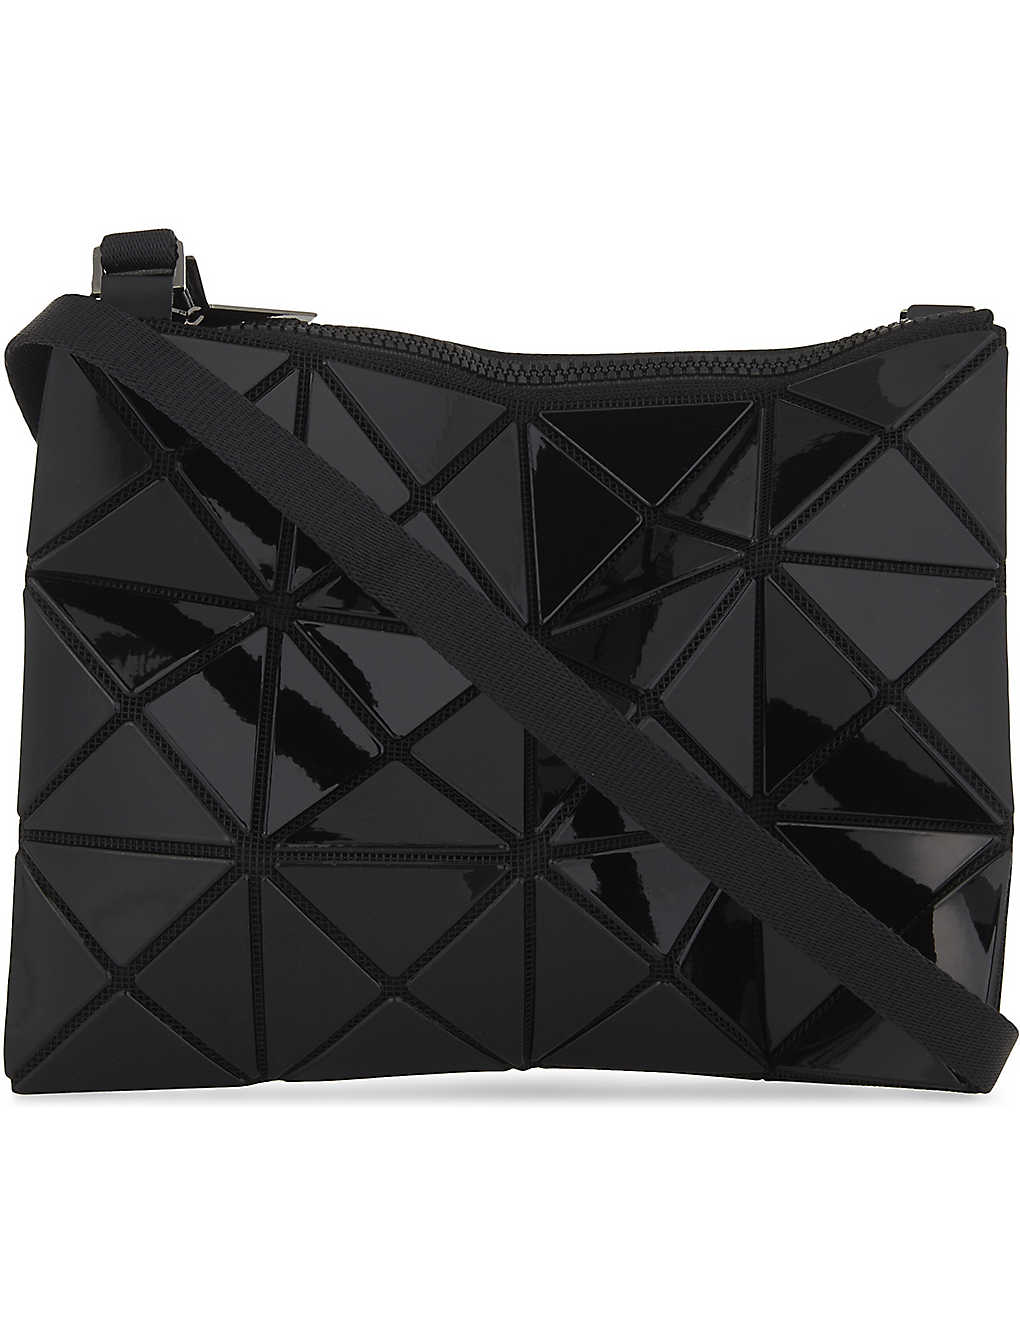 edafb9760a9a BAO BAO ISSEY MIYAKE - Lucent cross-body bag